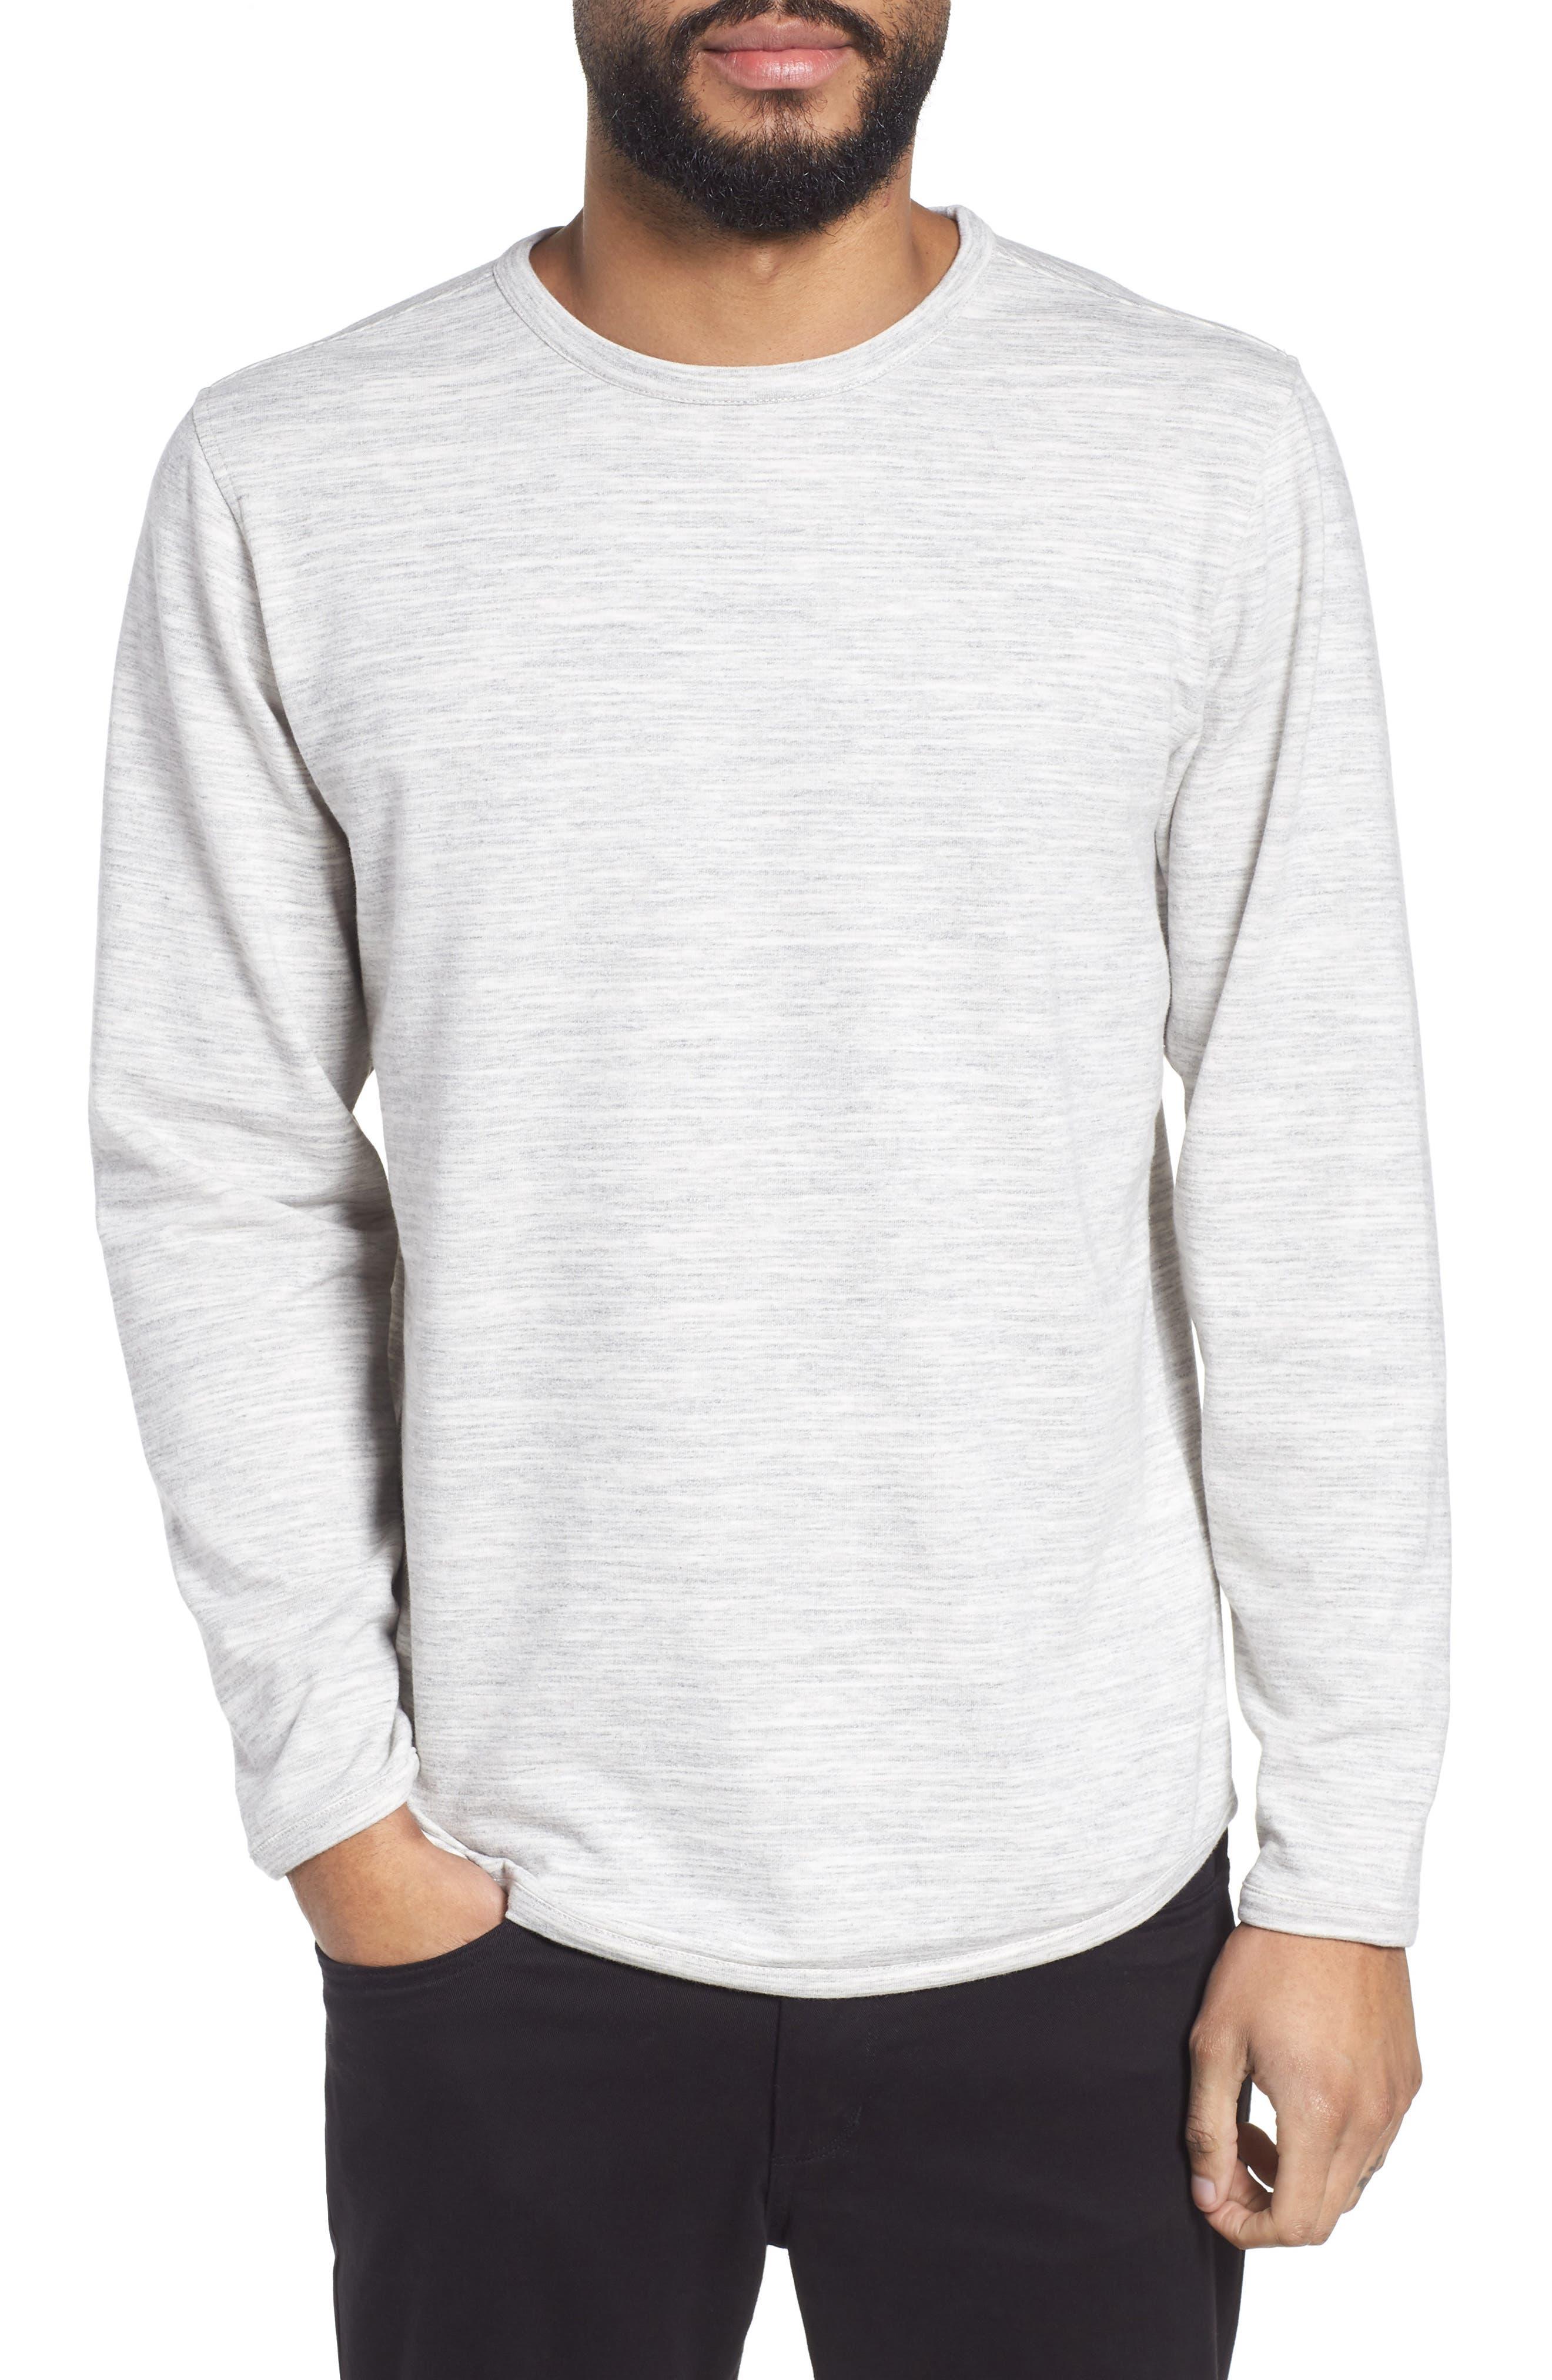 TWENTYMETRICTONS Long Sleeve T-Shirt